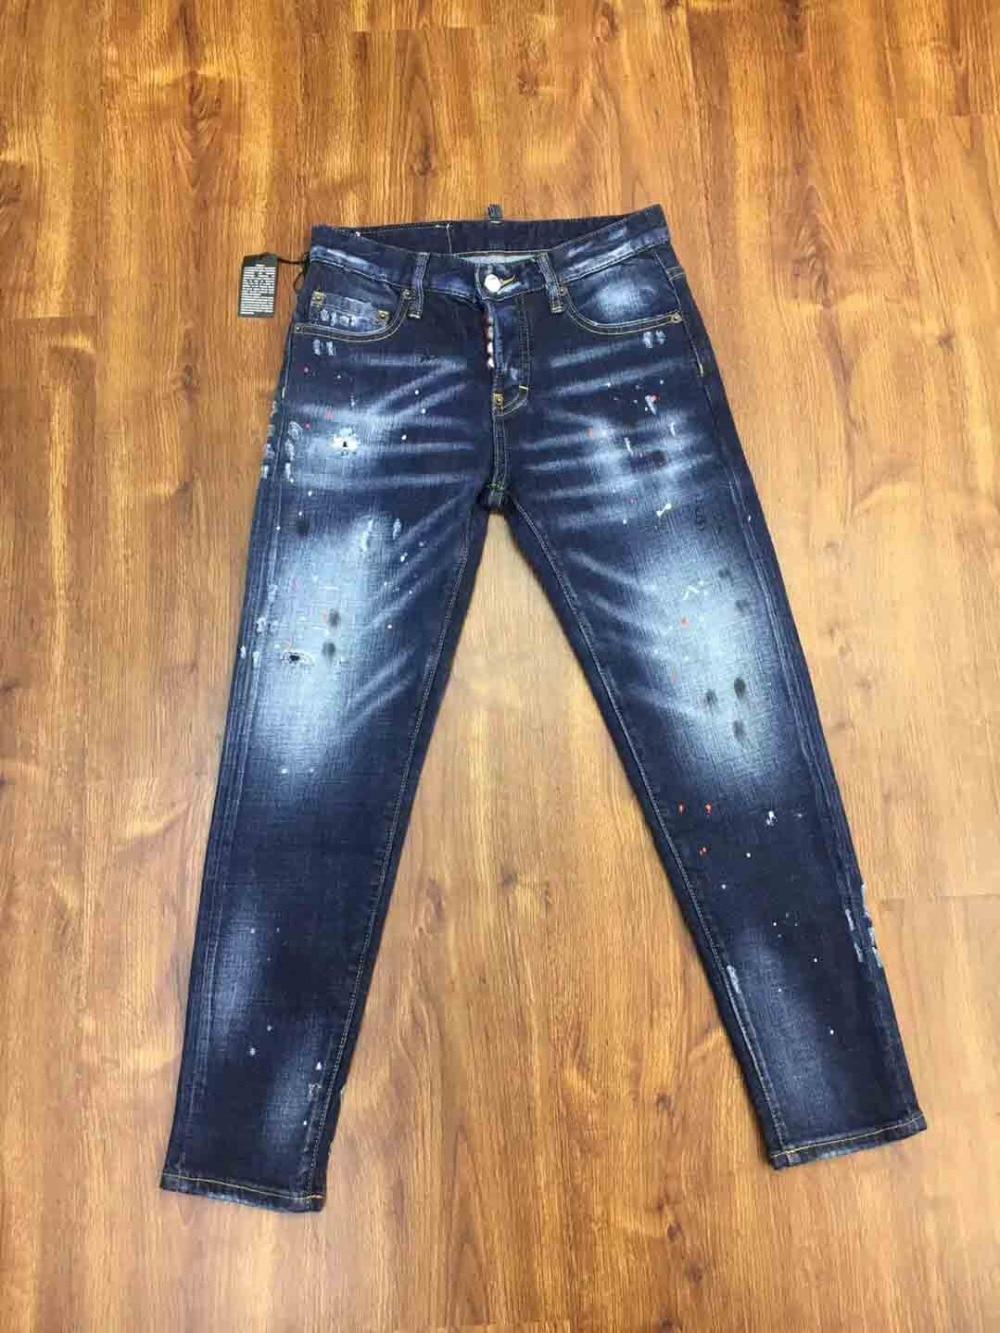 2019 New luxury italy Brand designer fashion zippers all denim skinny fit pleated biker   jeans   boyfriend for women